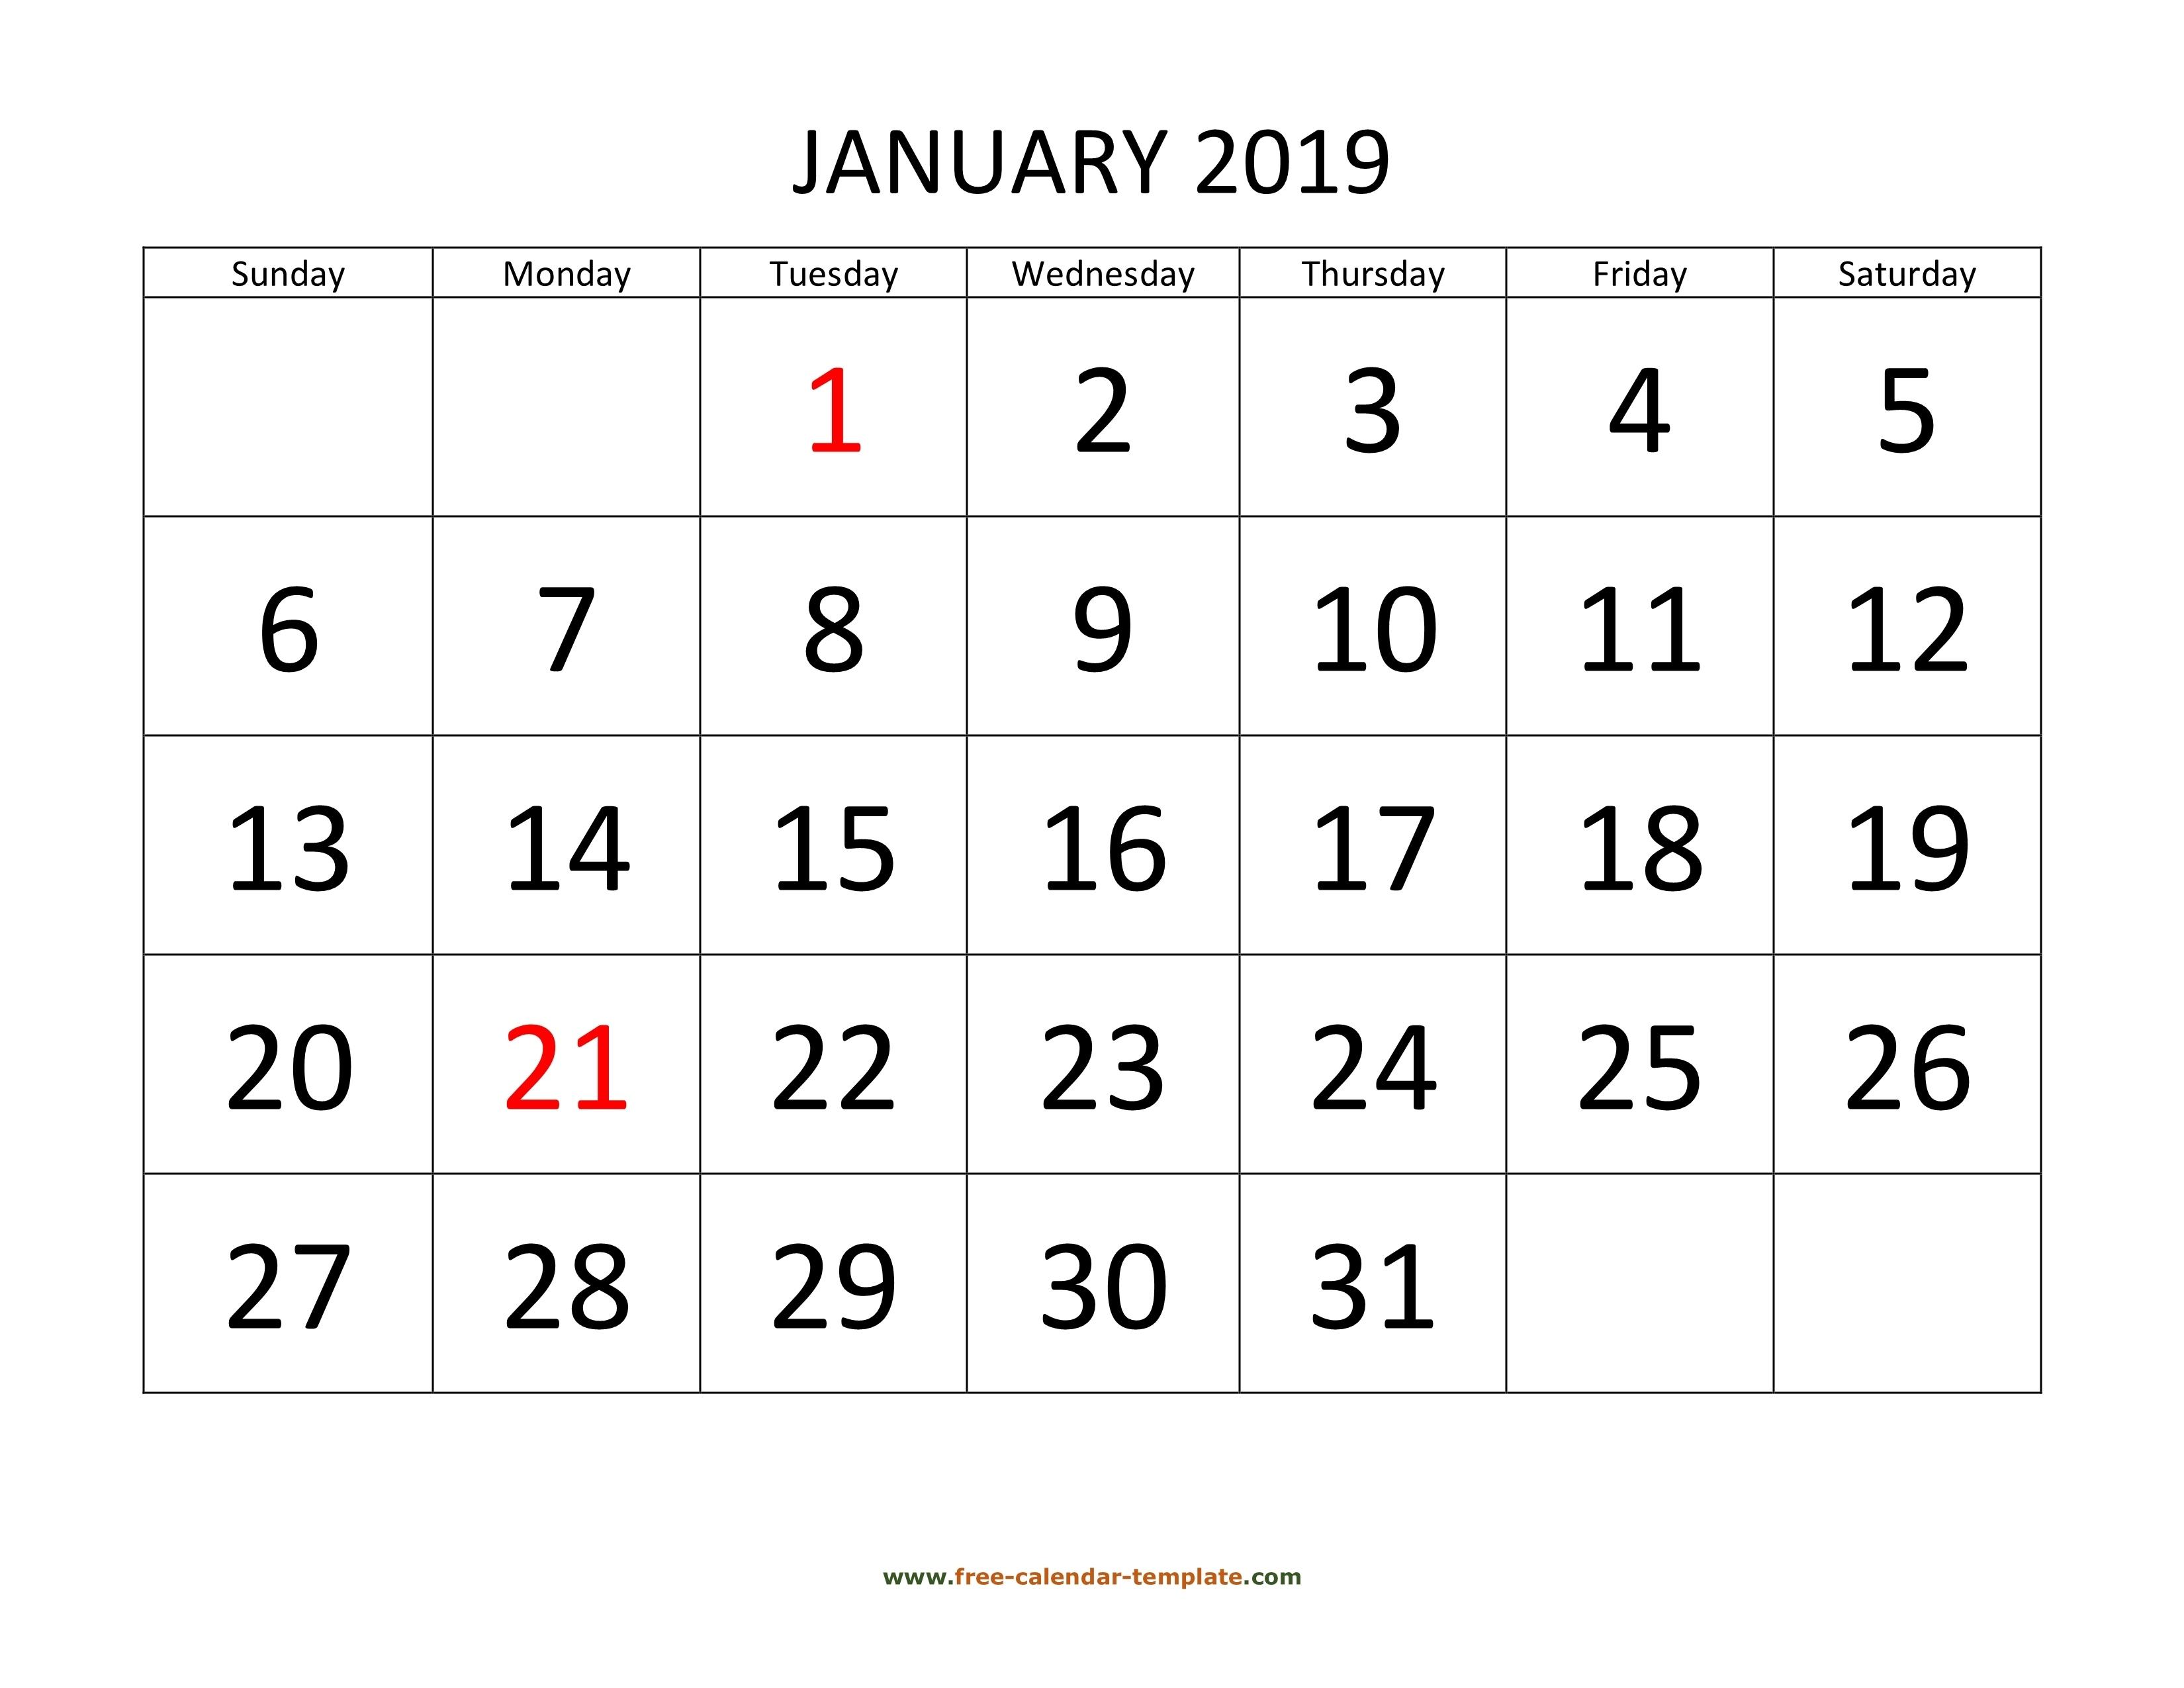 Printable Monthly Calendar 2019 | Free-Calendar-Template Free Calendar Grid Template